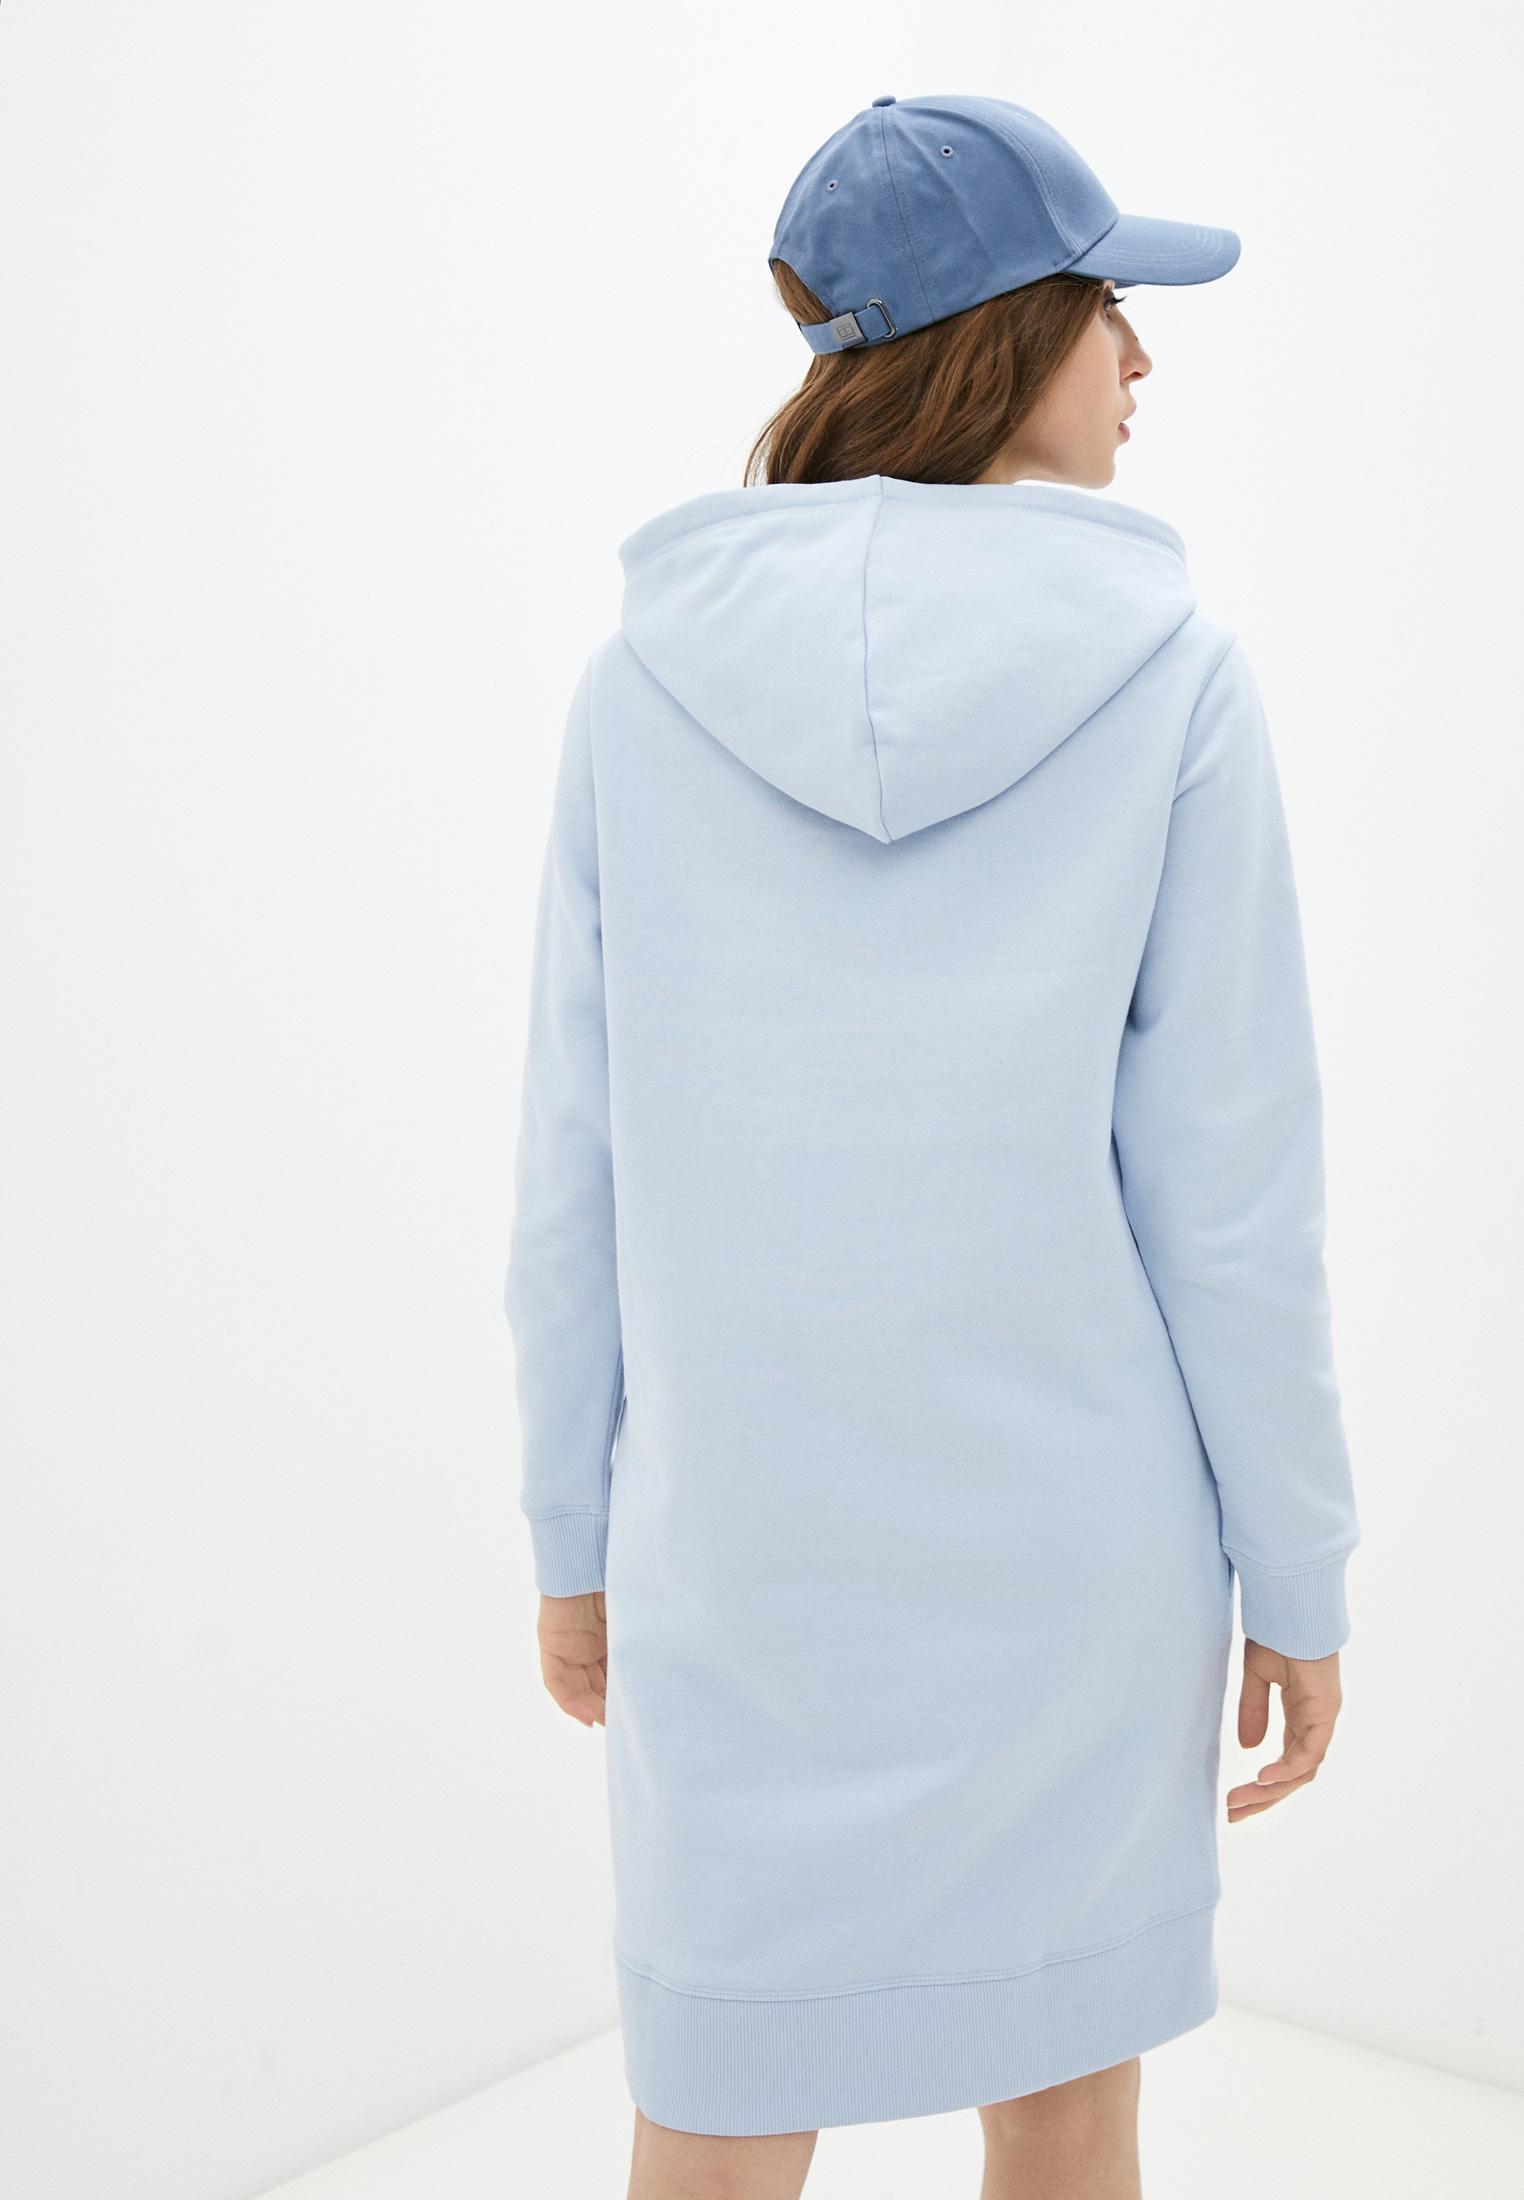 Платье Tommy Hilfiger (Томми Хилфигер) WW0WW30365: изображение 3